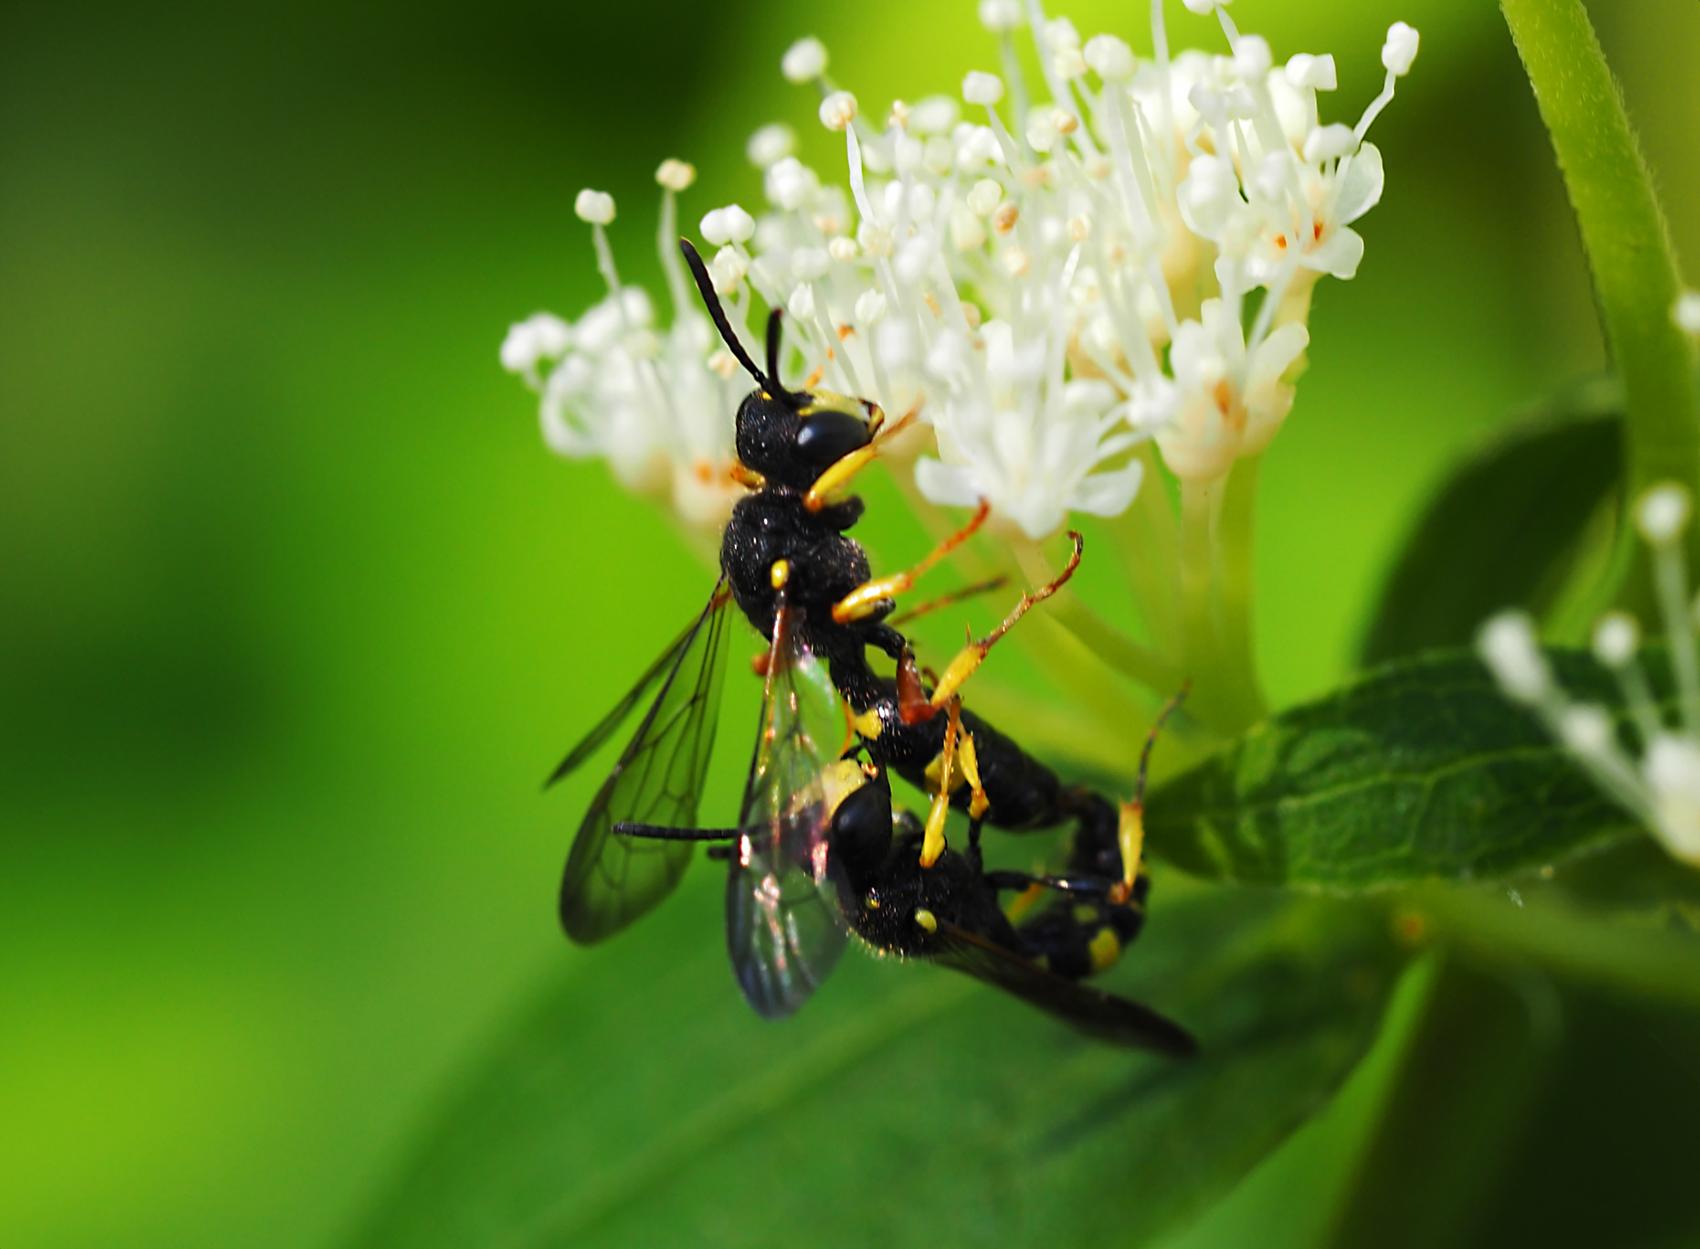 Bienenjagende Knotenwespe02 (Cerceris rybyensis)